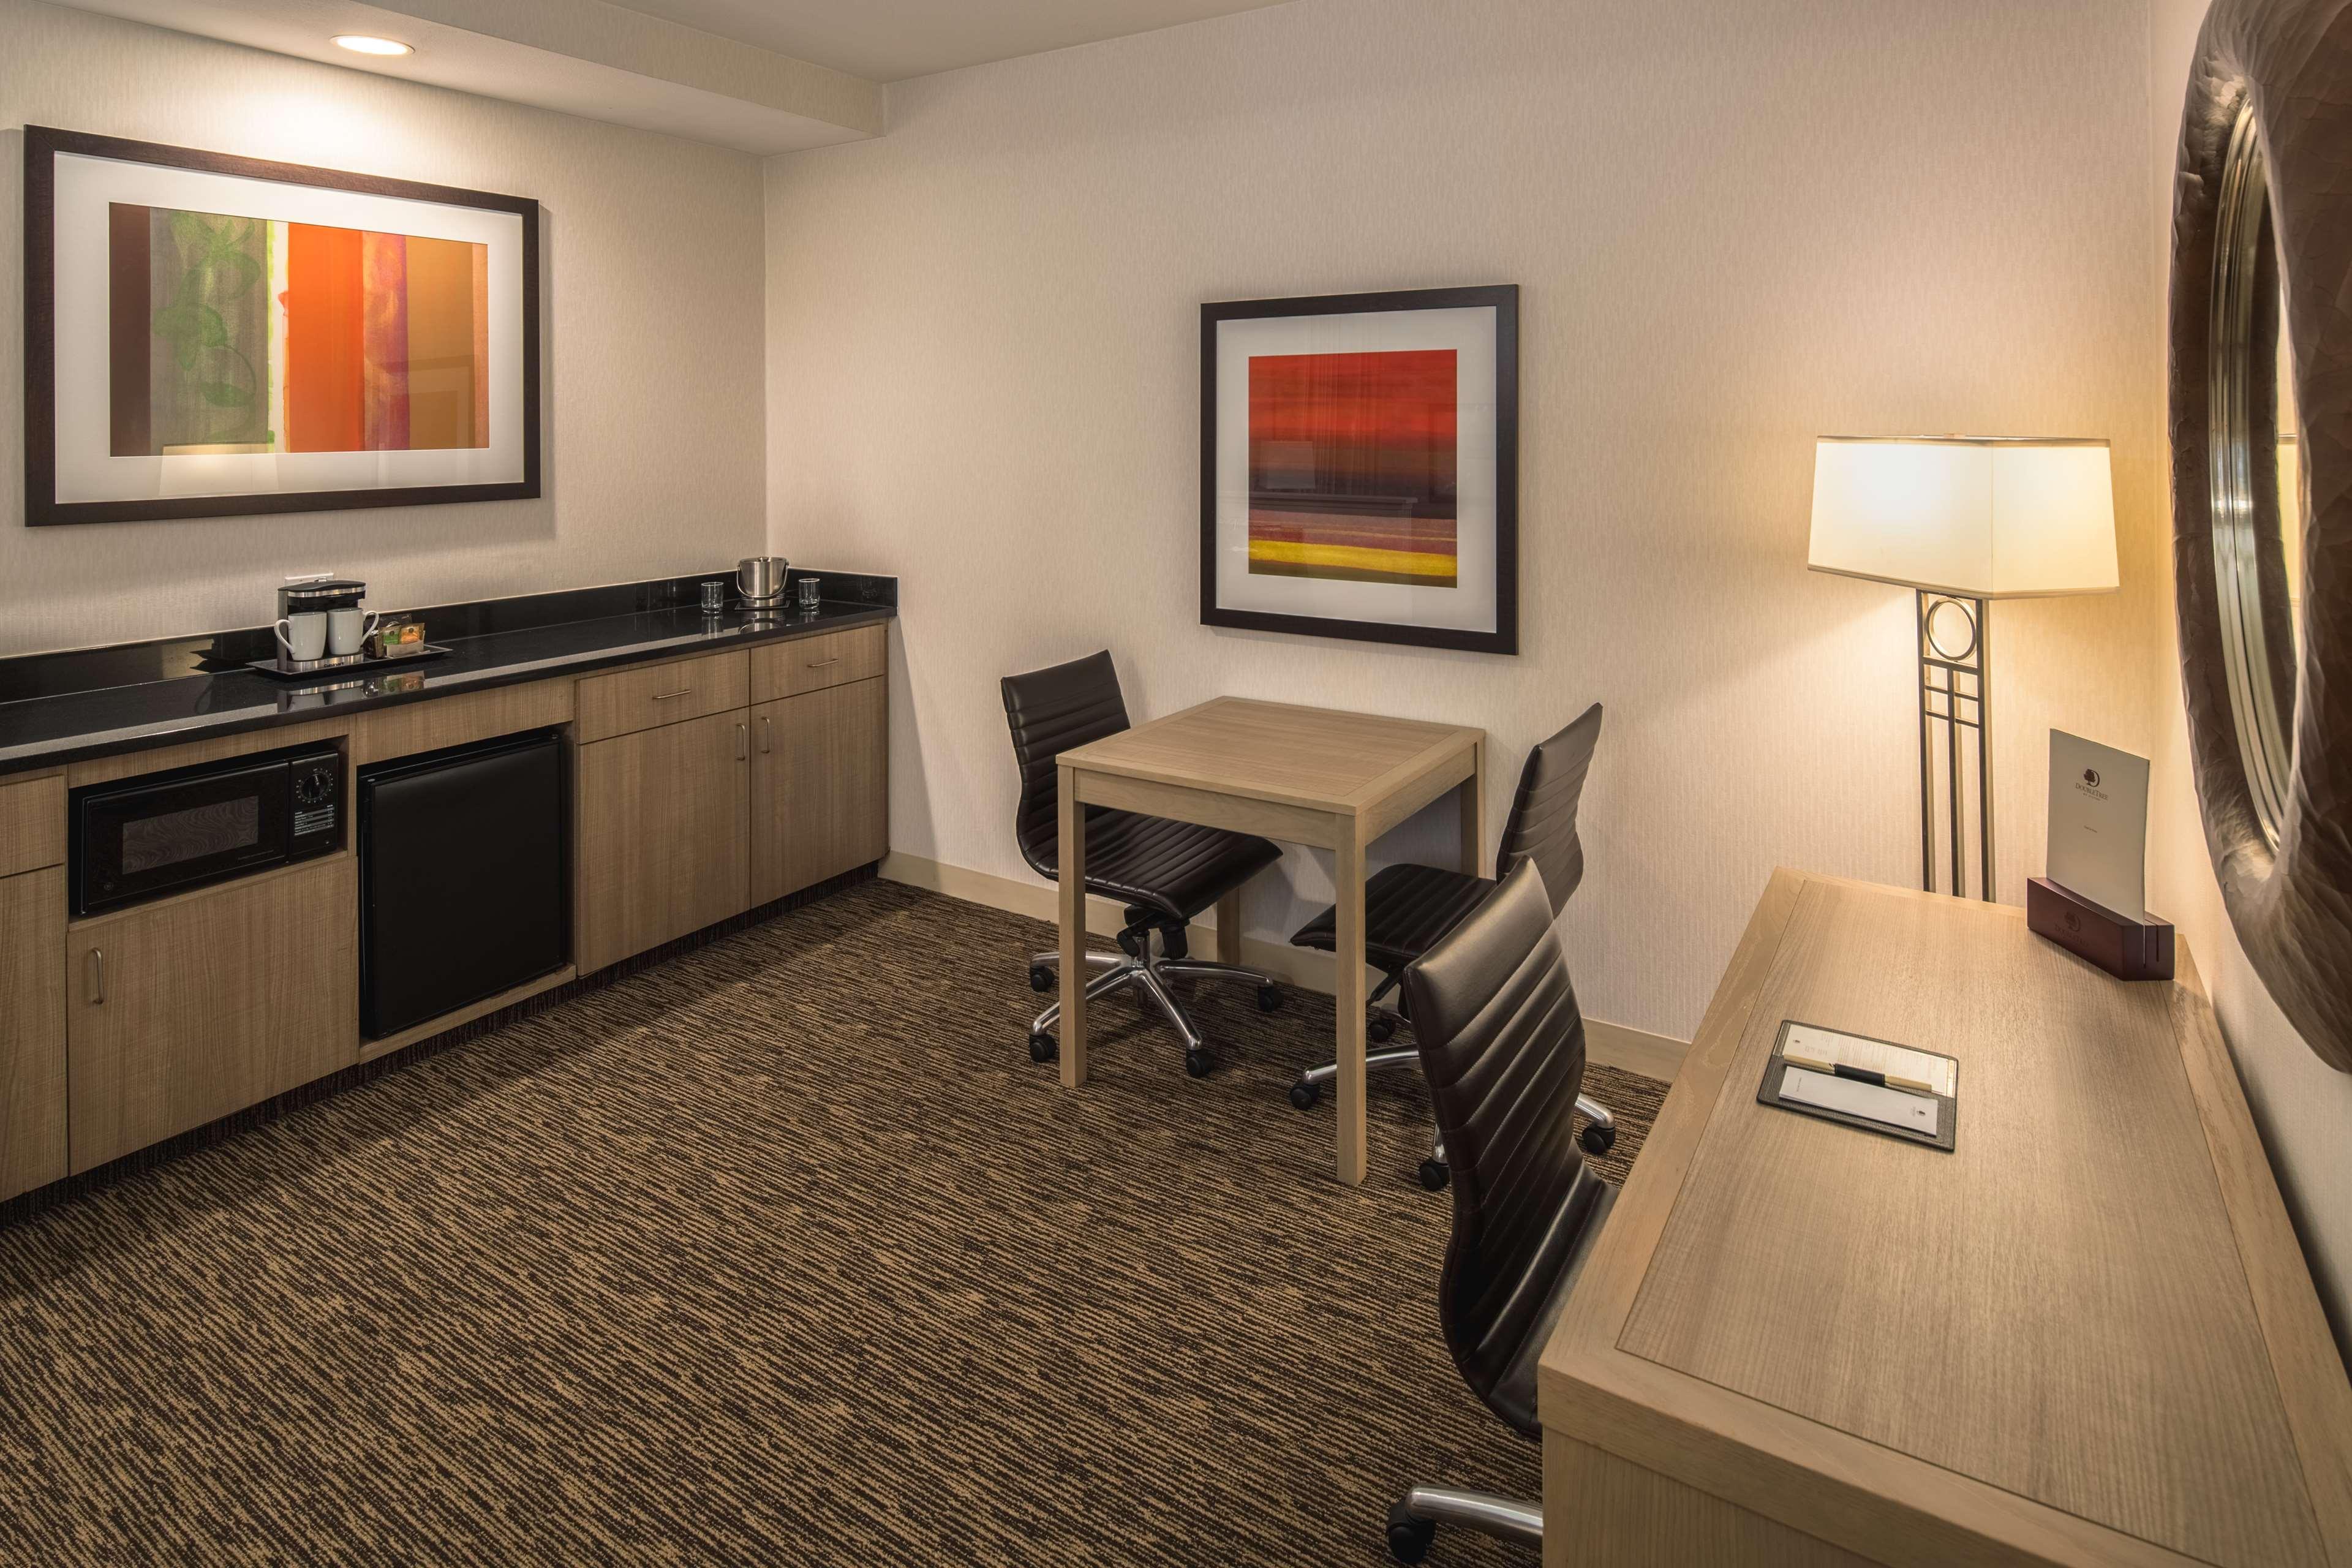 DoubleTree by Hilton Hotel Vancouver, Washington image 20